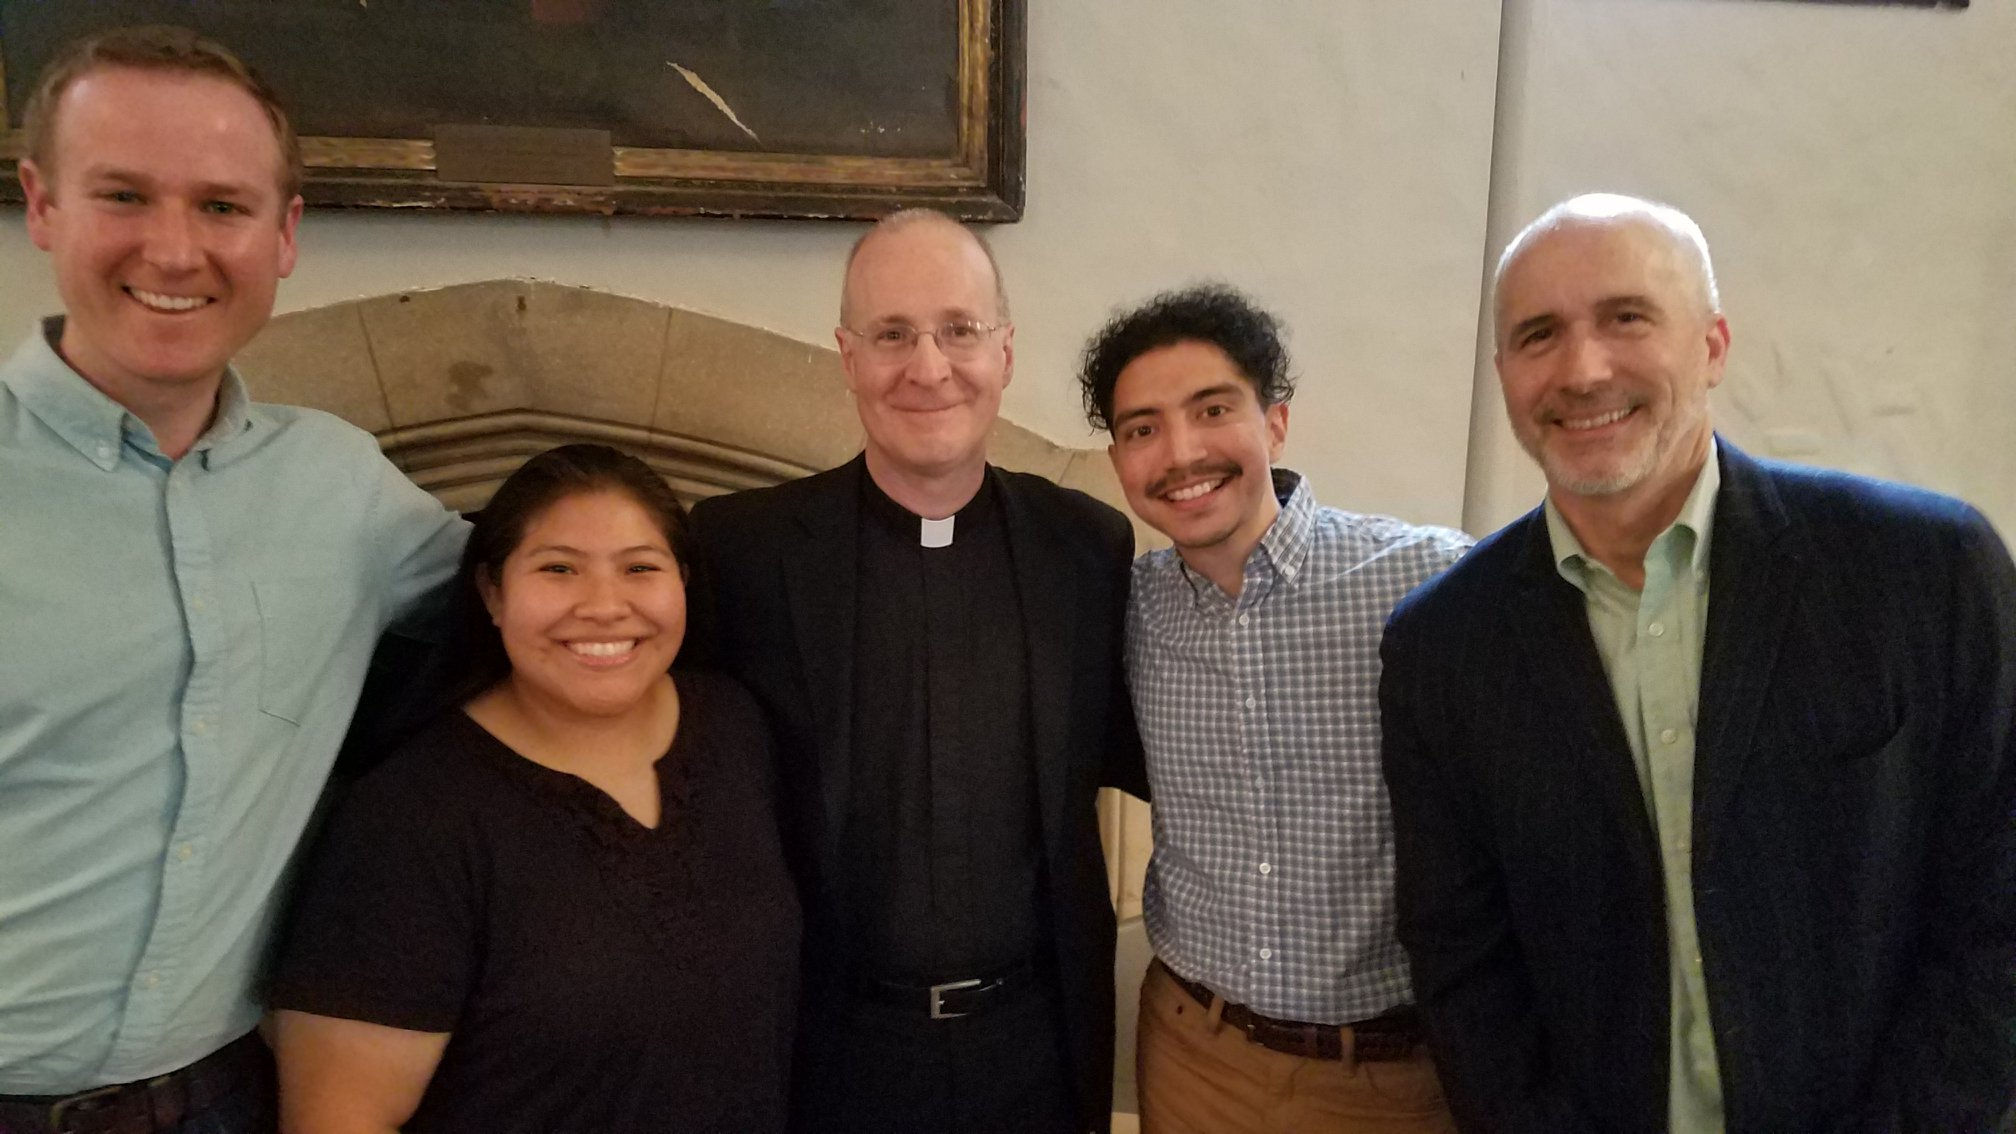 L to R: Jason Steidl, Jessica Tezen, Fr. James Martin, Xorje Olivares, David Gibson